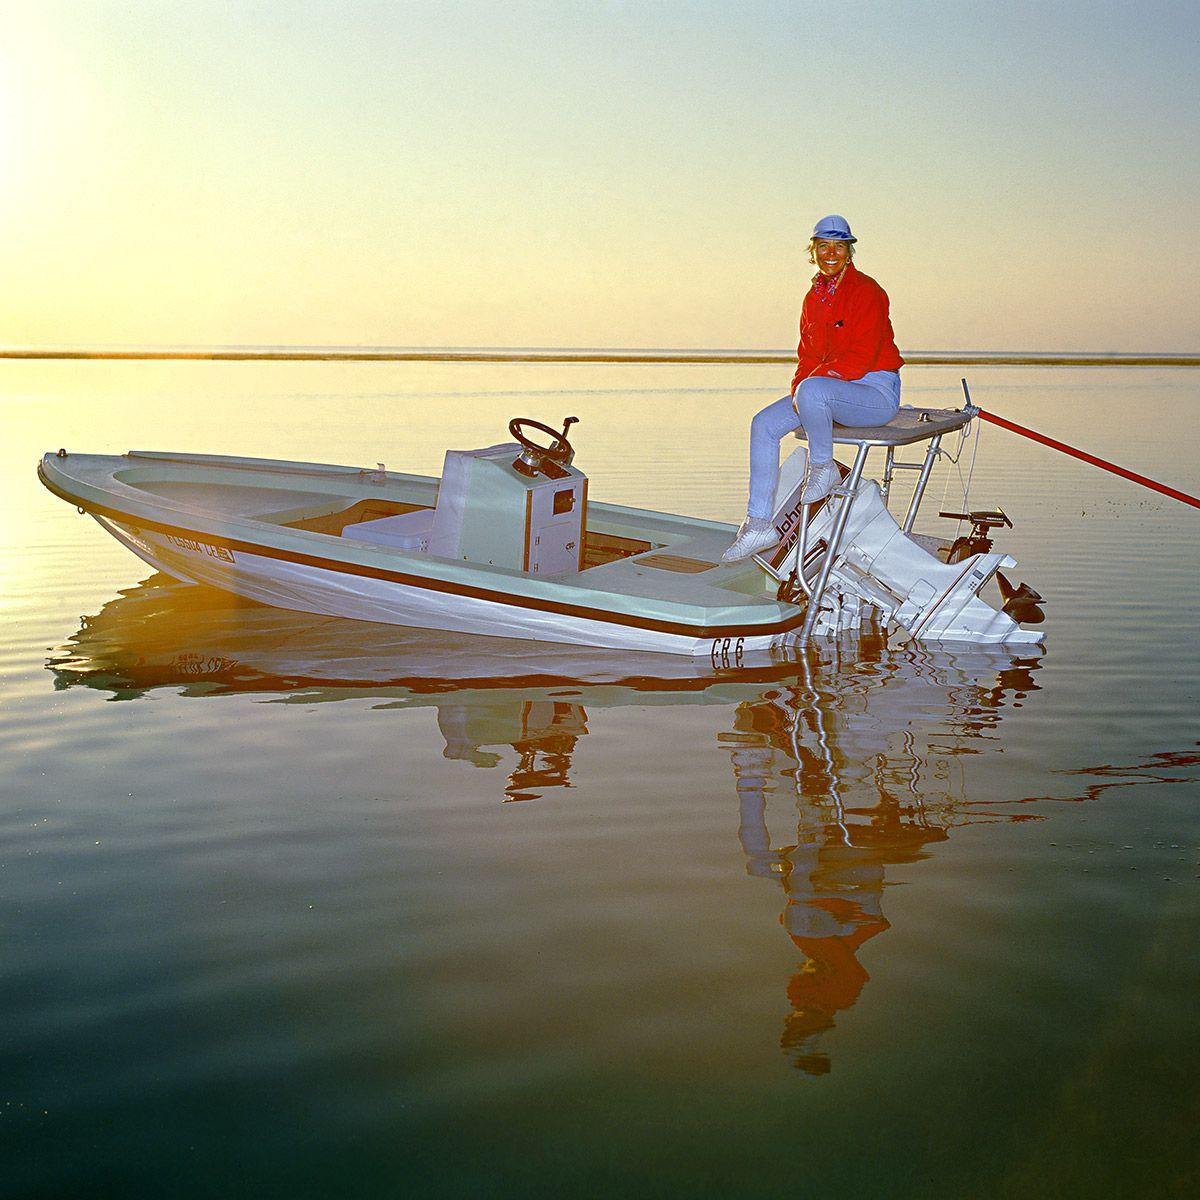 woman guide, woman fishing guide, flats guide,  Linda Drake, Key West, portrait